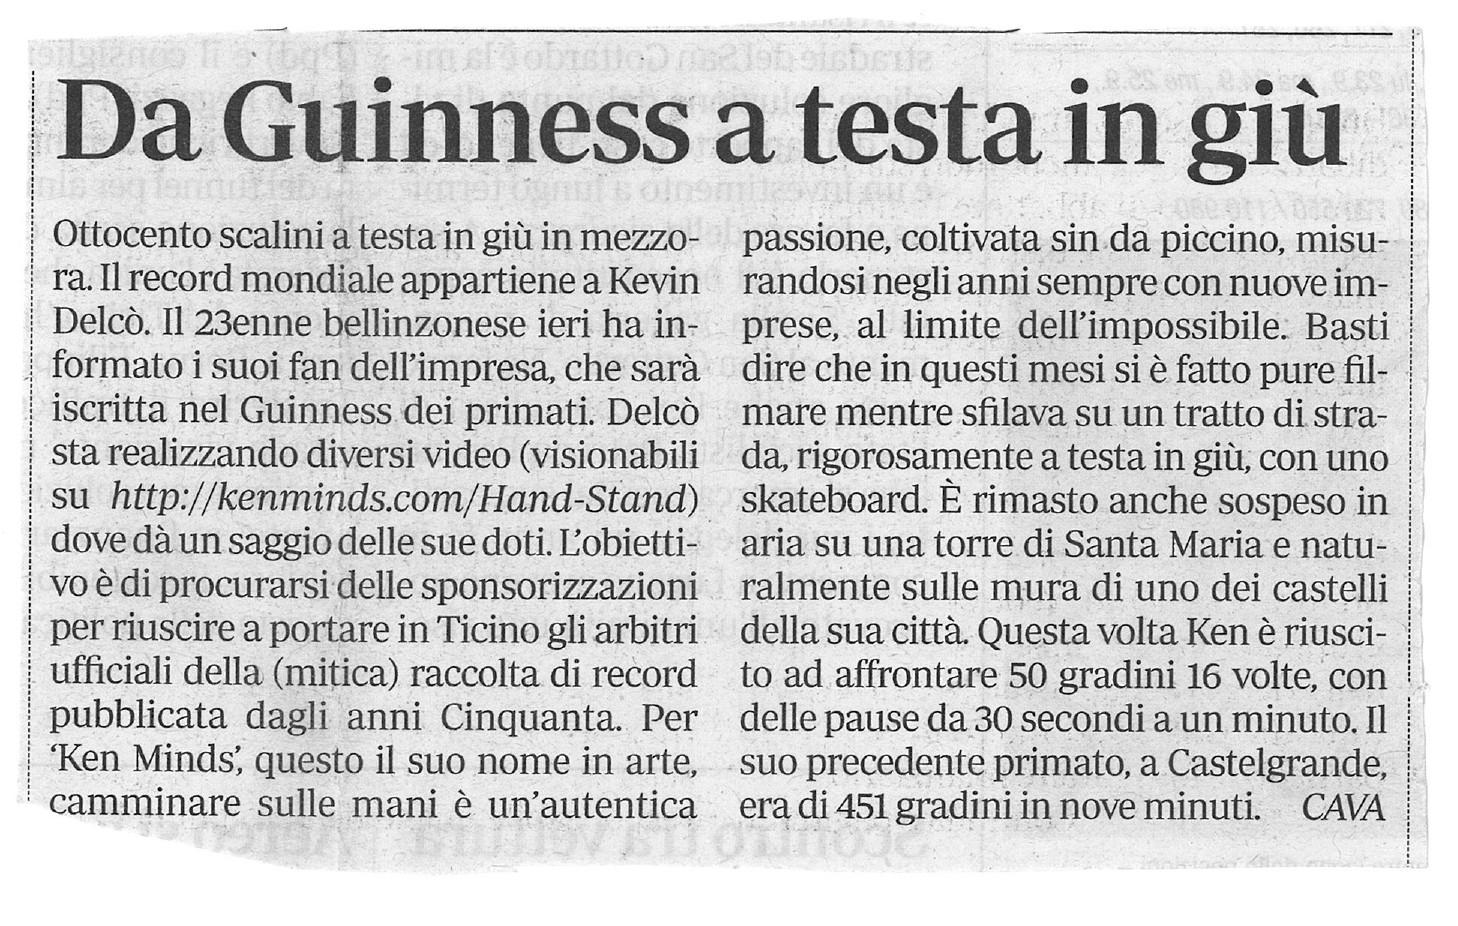 guinness_a_testa_in_giù.jpg